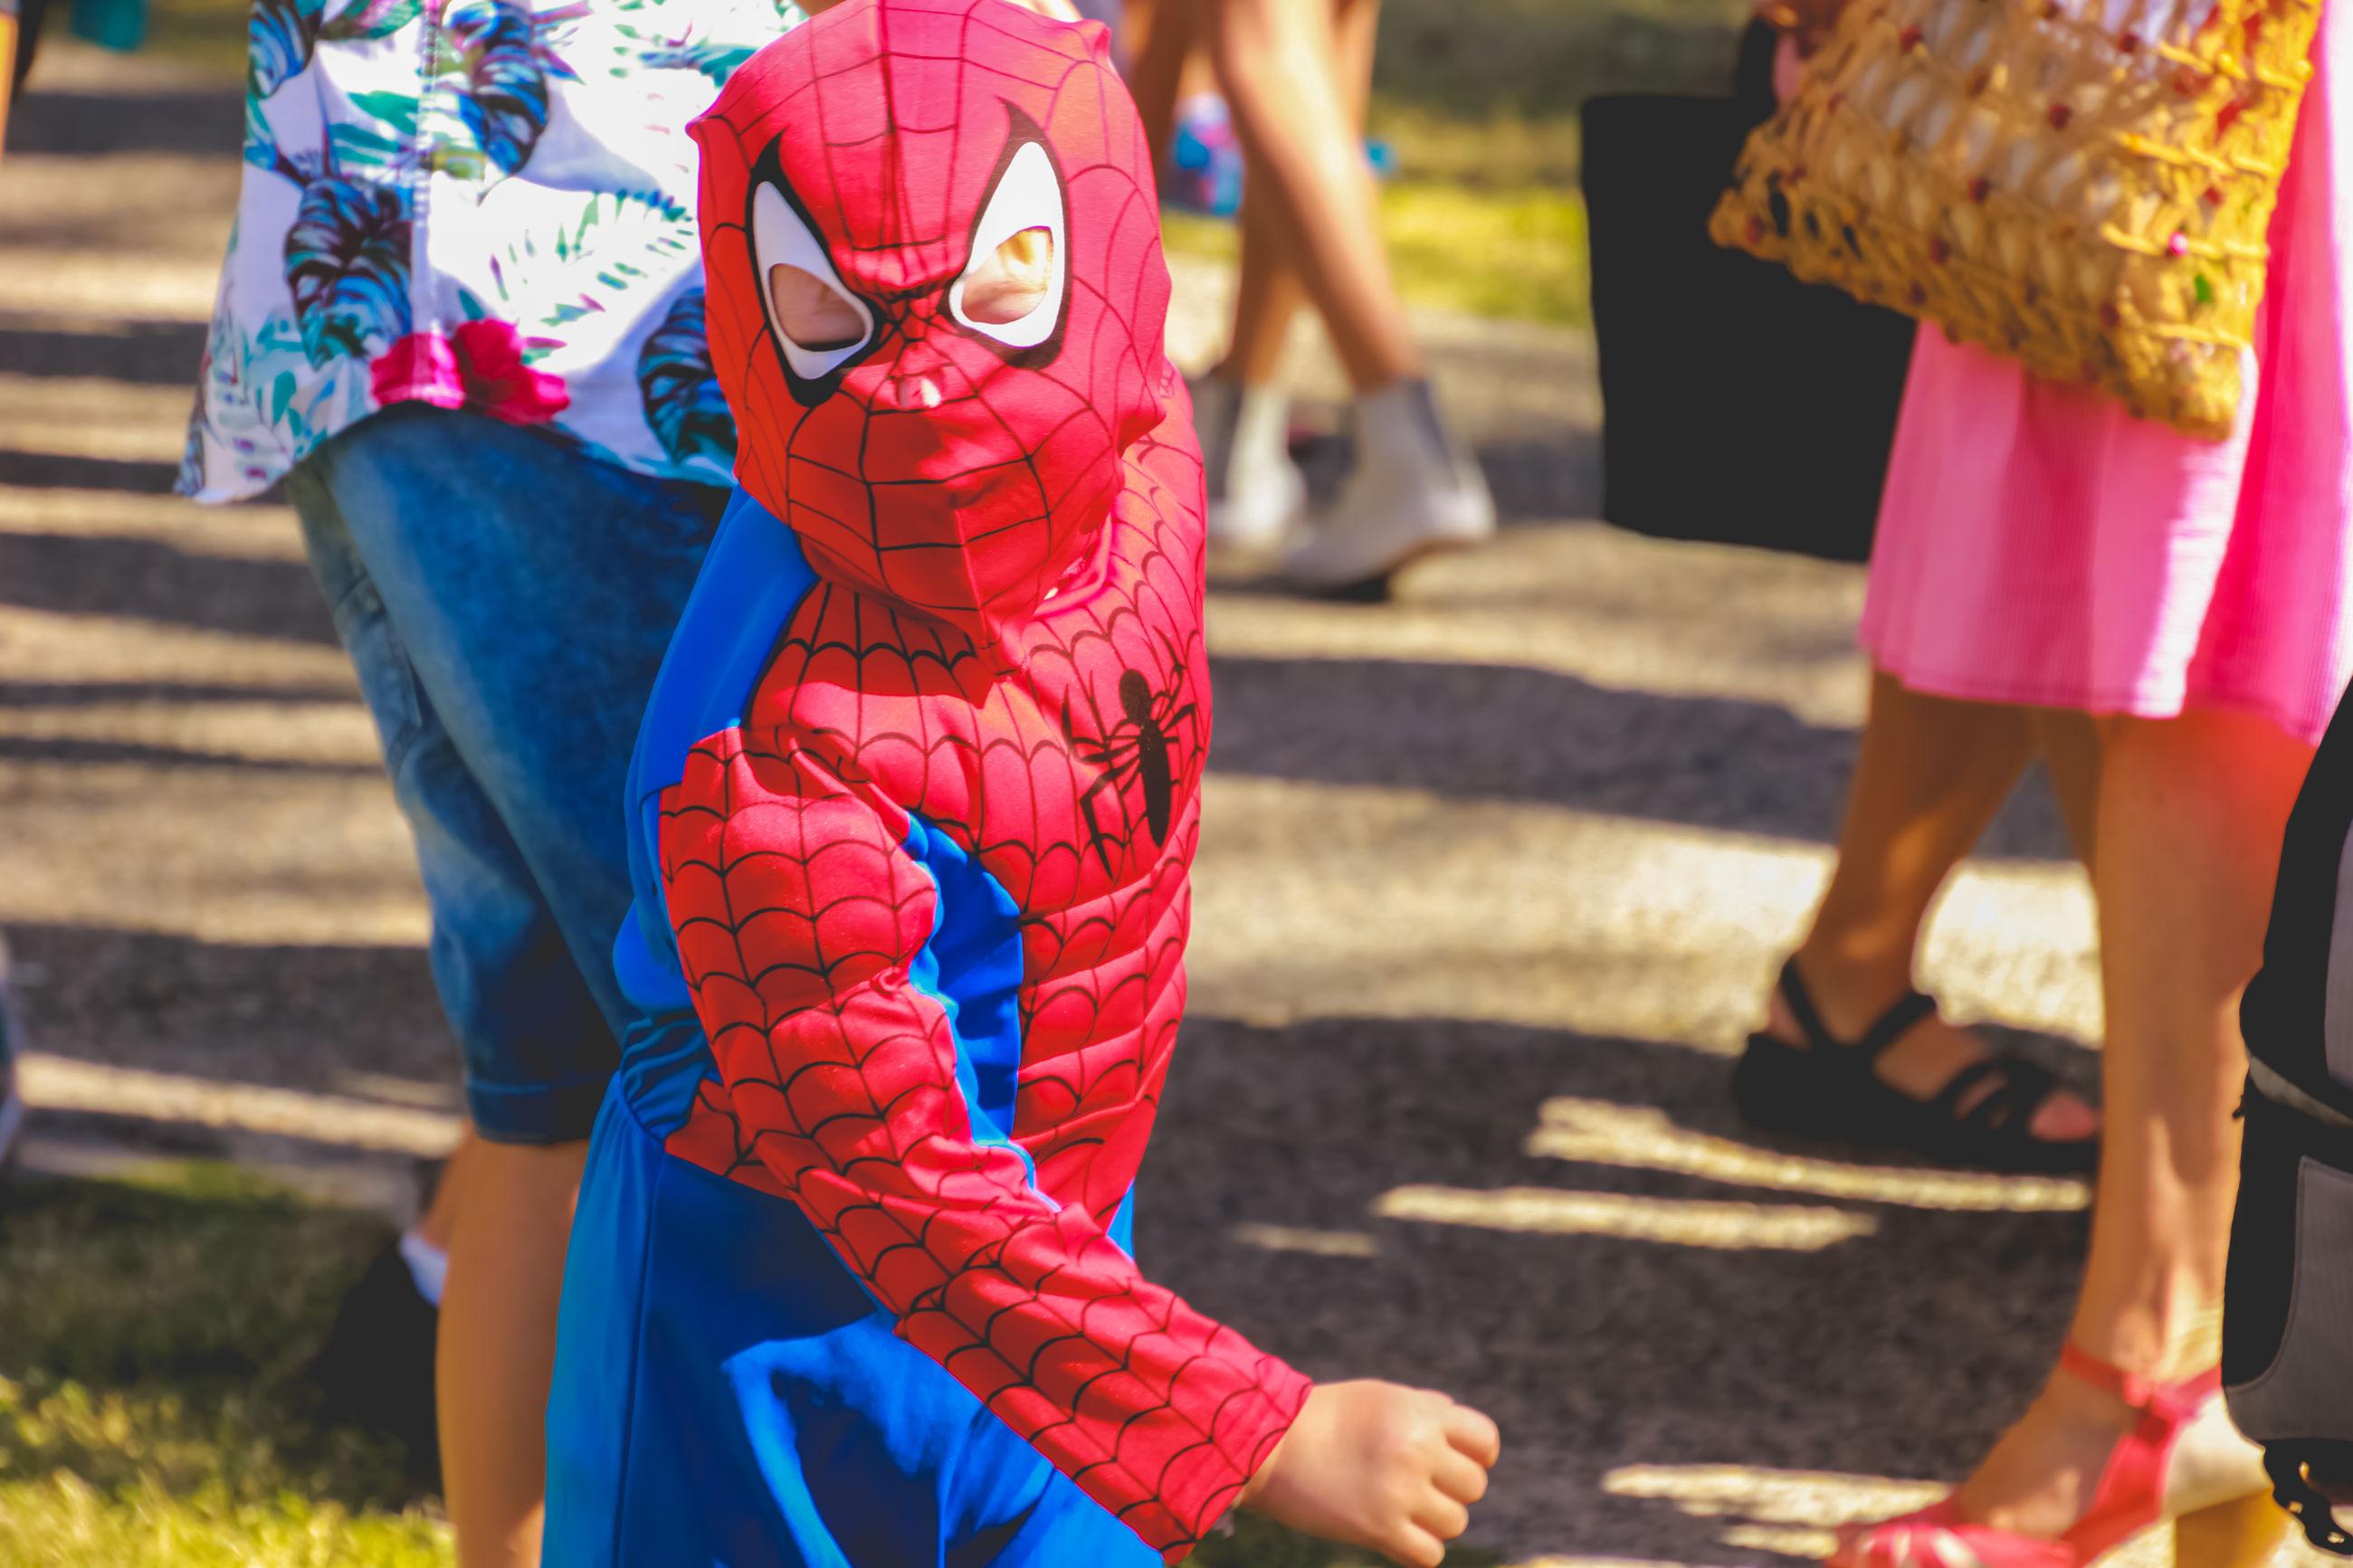 Child wearing superhero costume on street